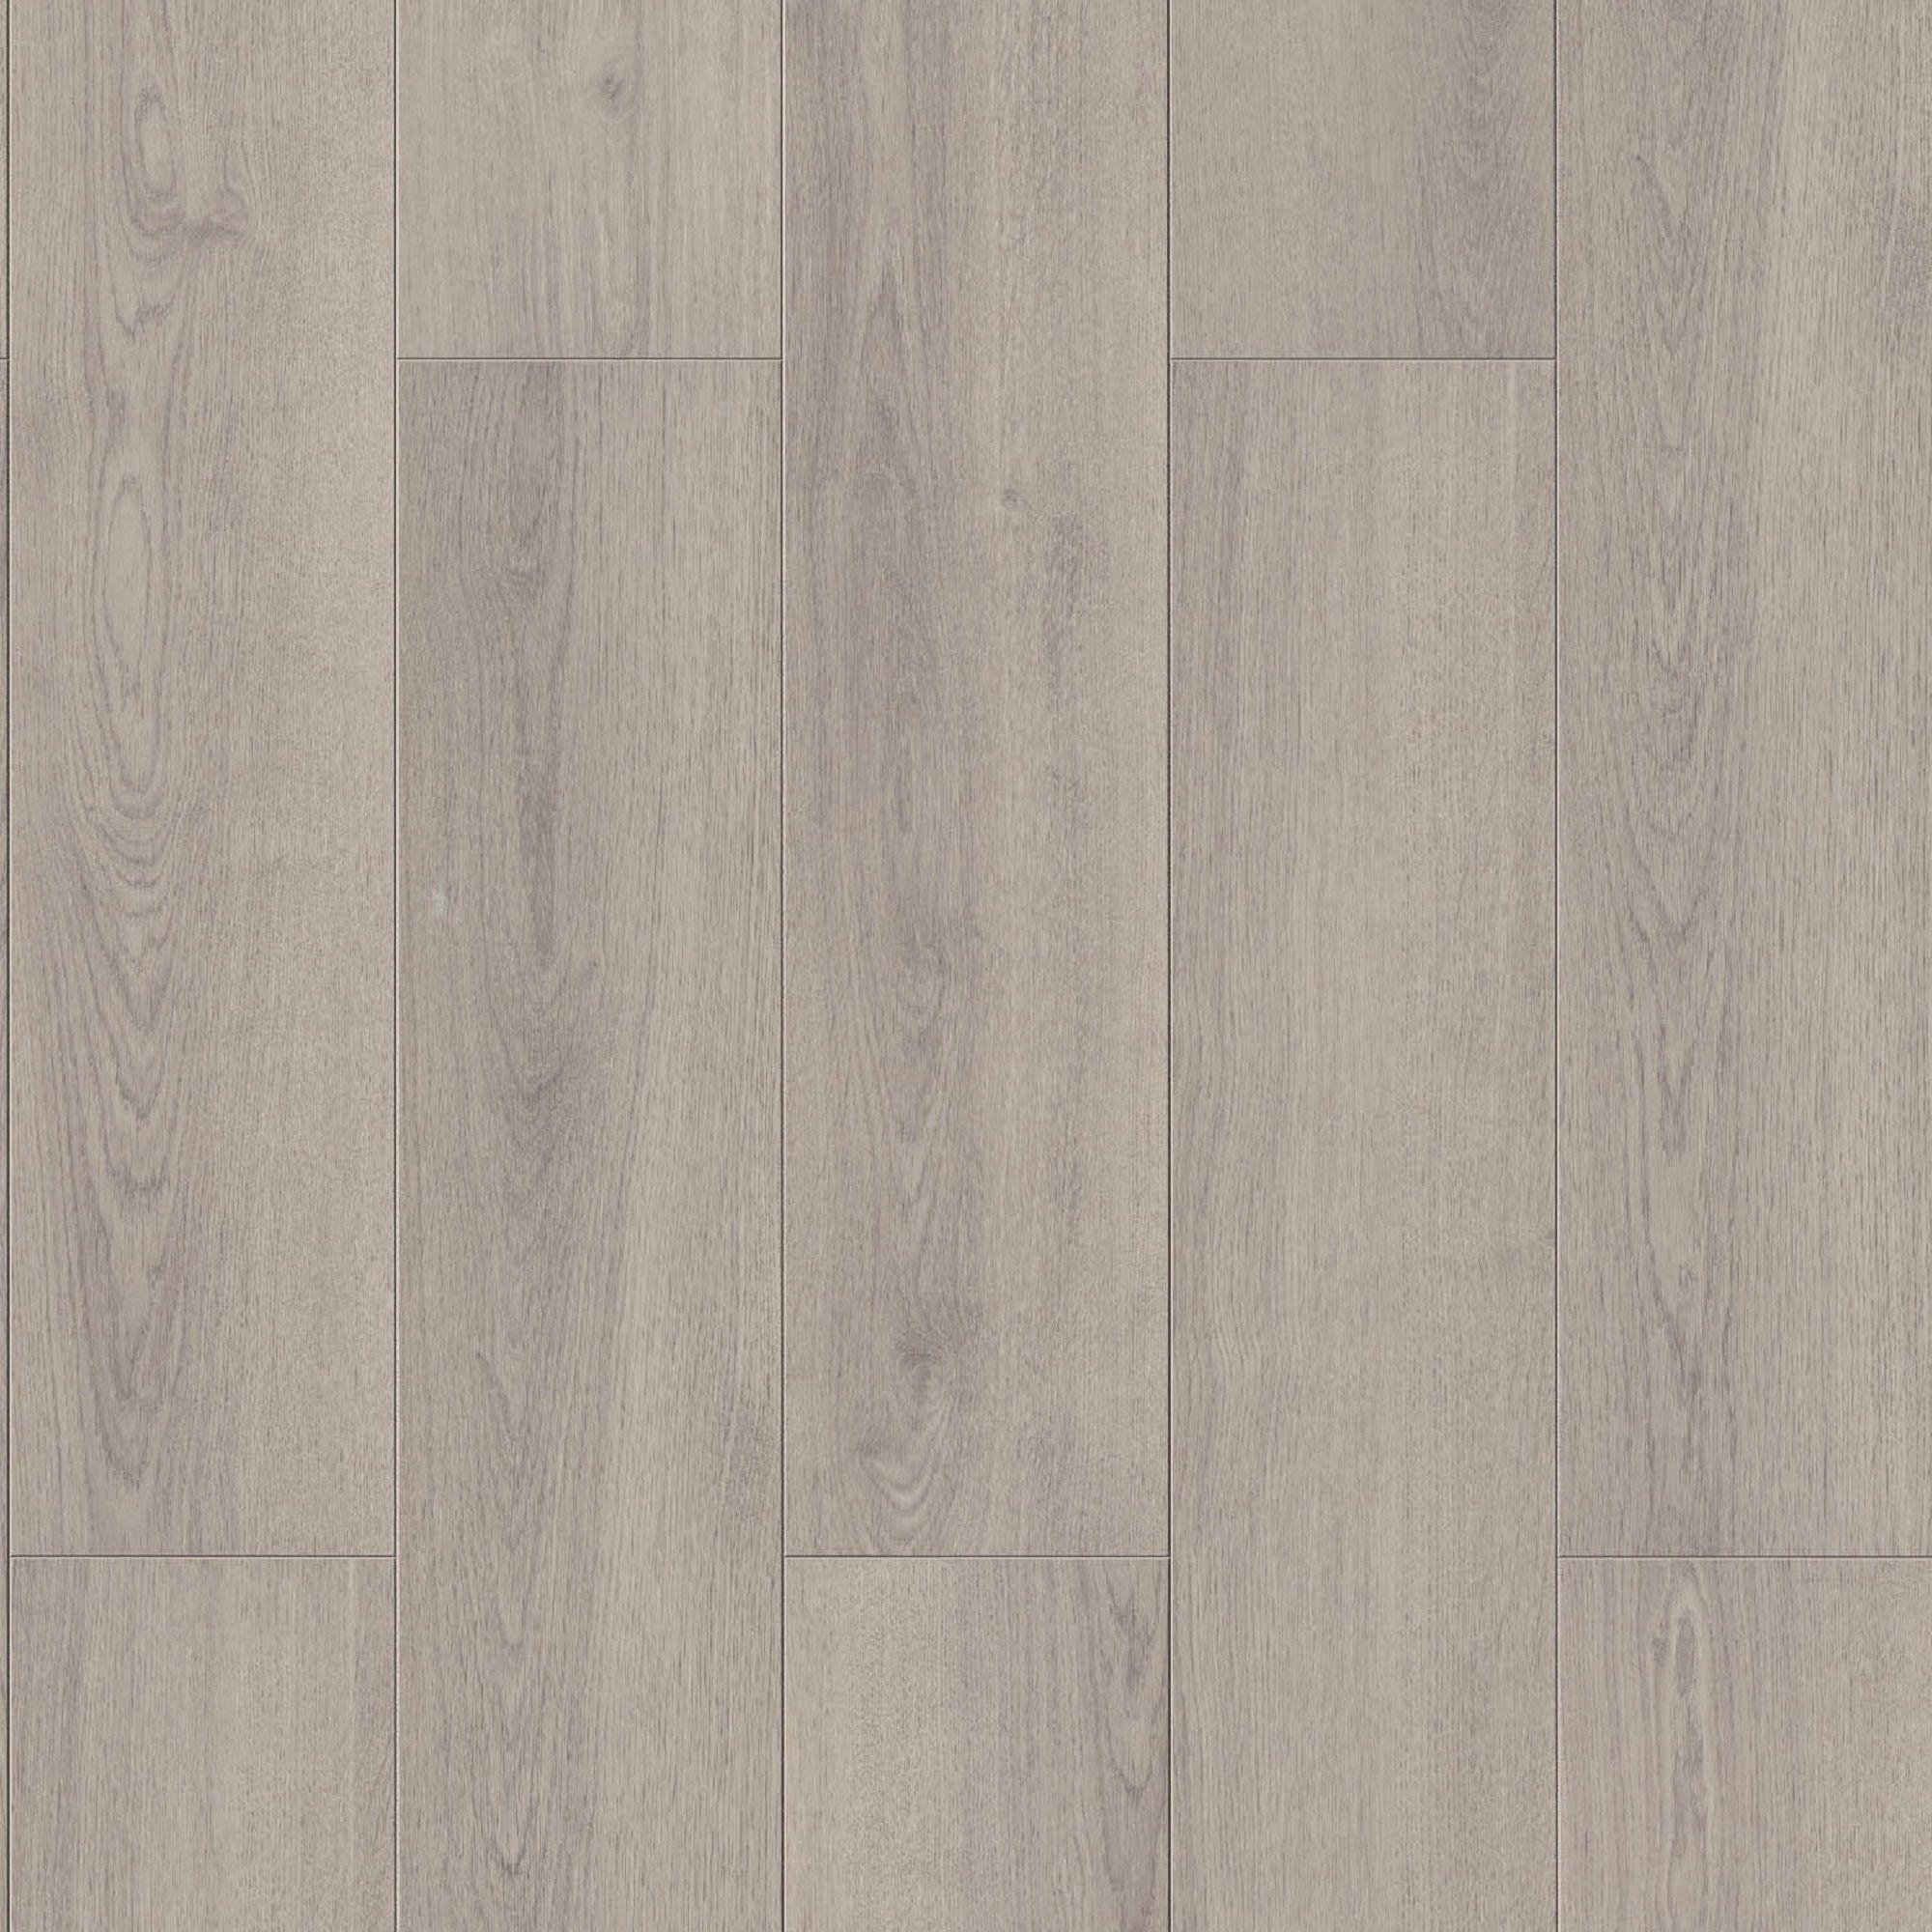 Greenlees Grey Oak Effect Laminate Flooring 1.99m Pack | Departments | DIY  at B&Q